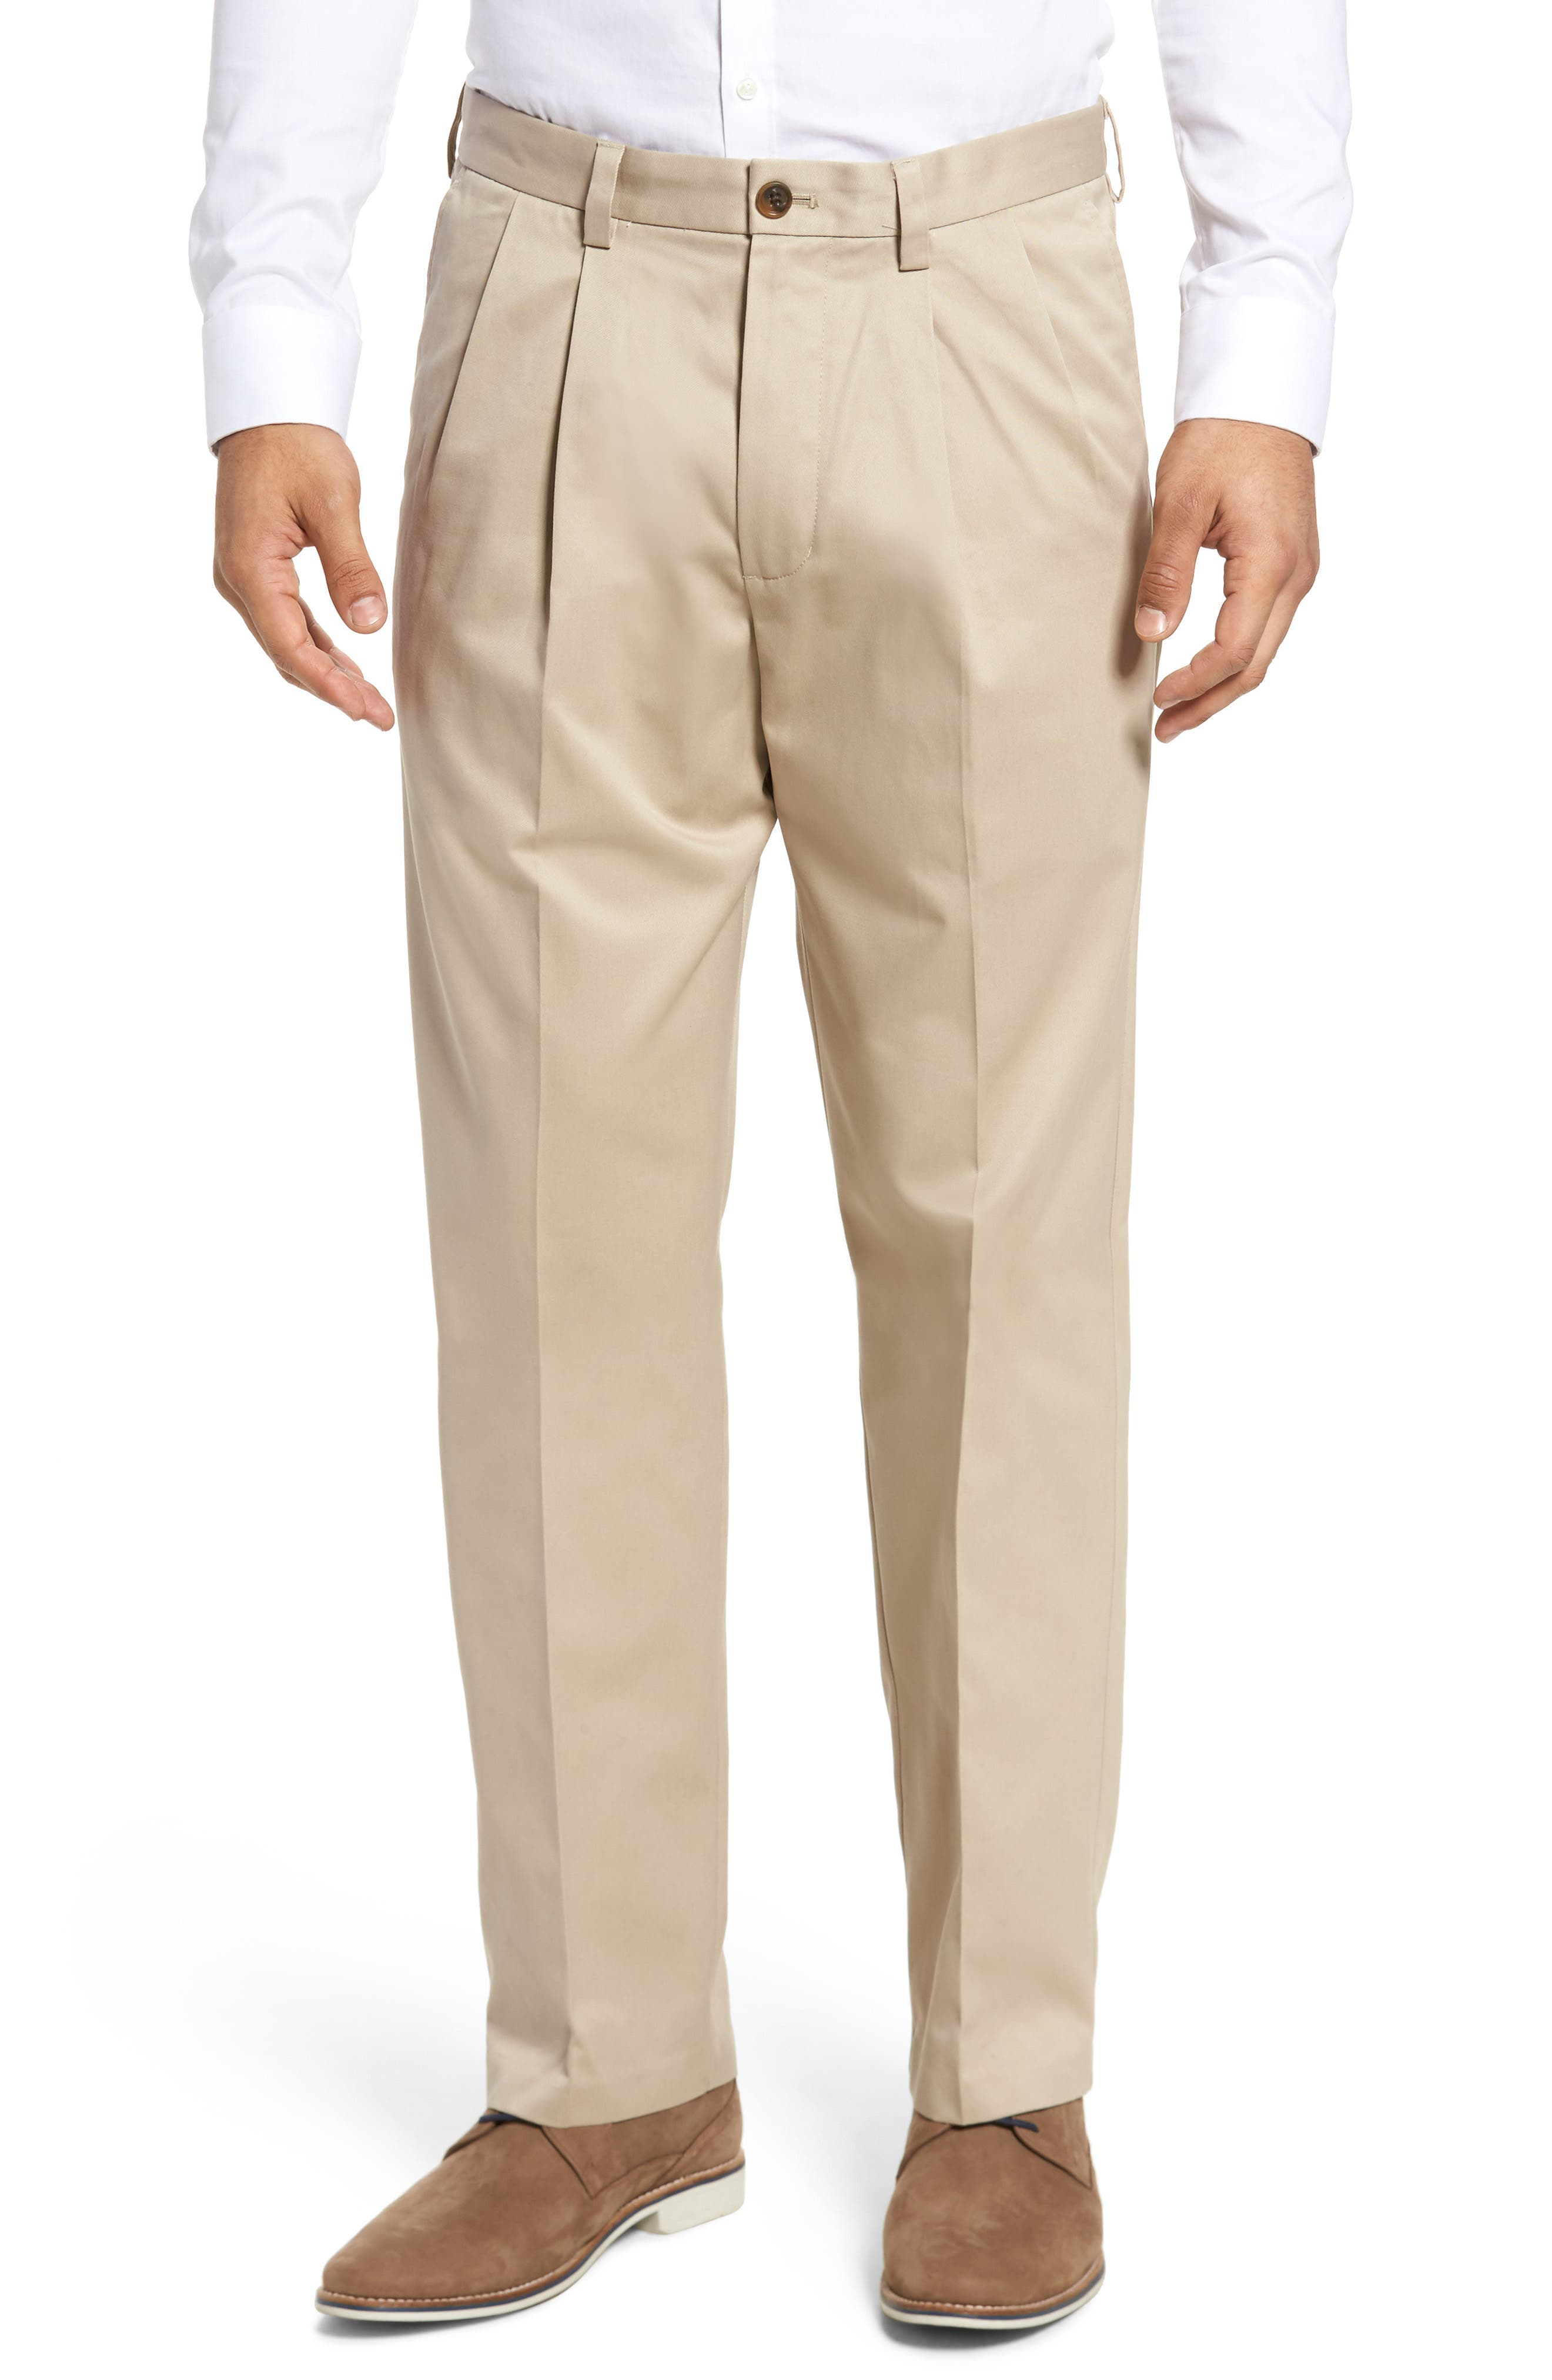 Men's Big & Tall Nordstrom Men's Shop 'Classic' Smartcare(TM) Relaxed Fit Double Pleated Cotton Pants